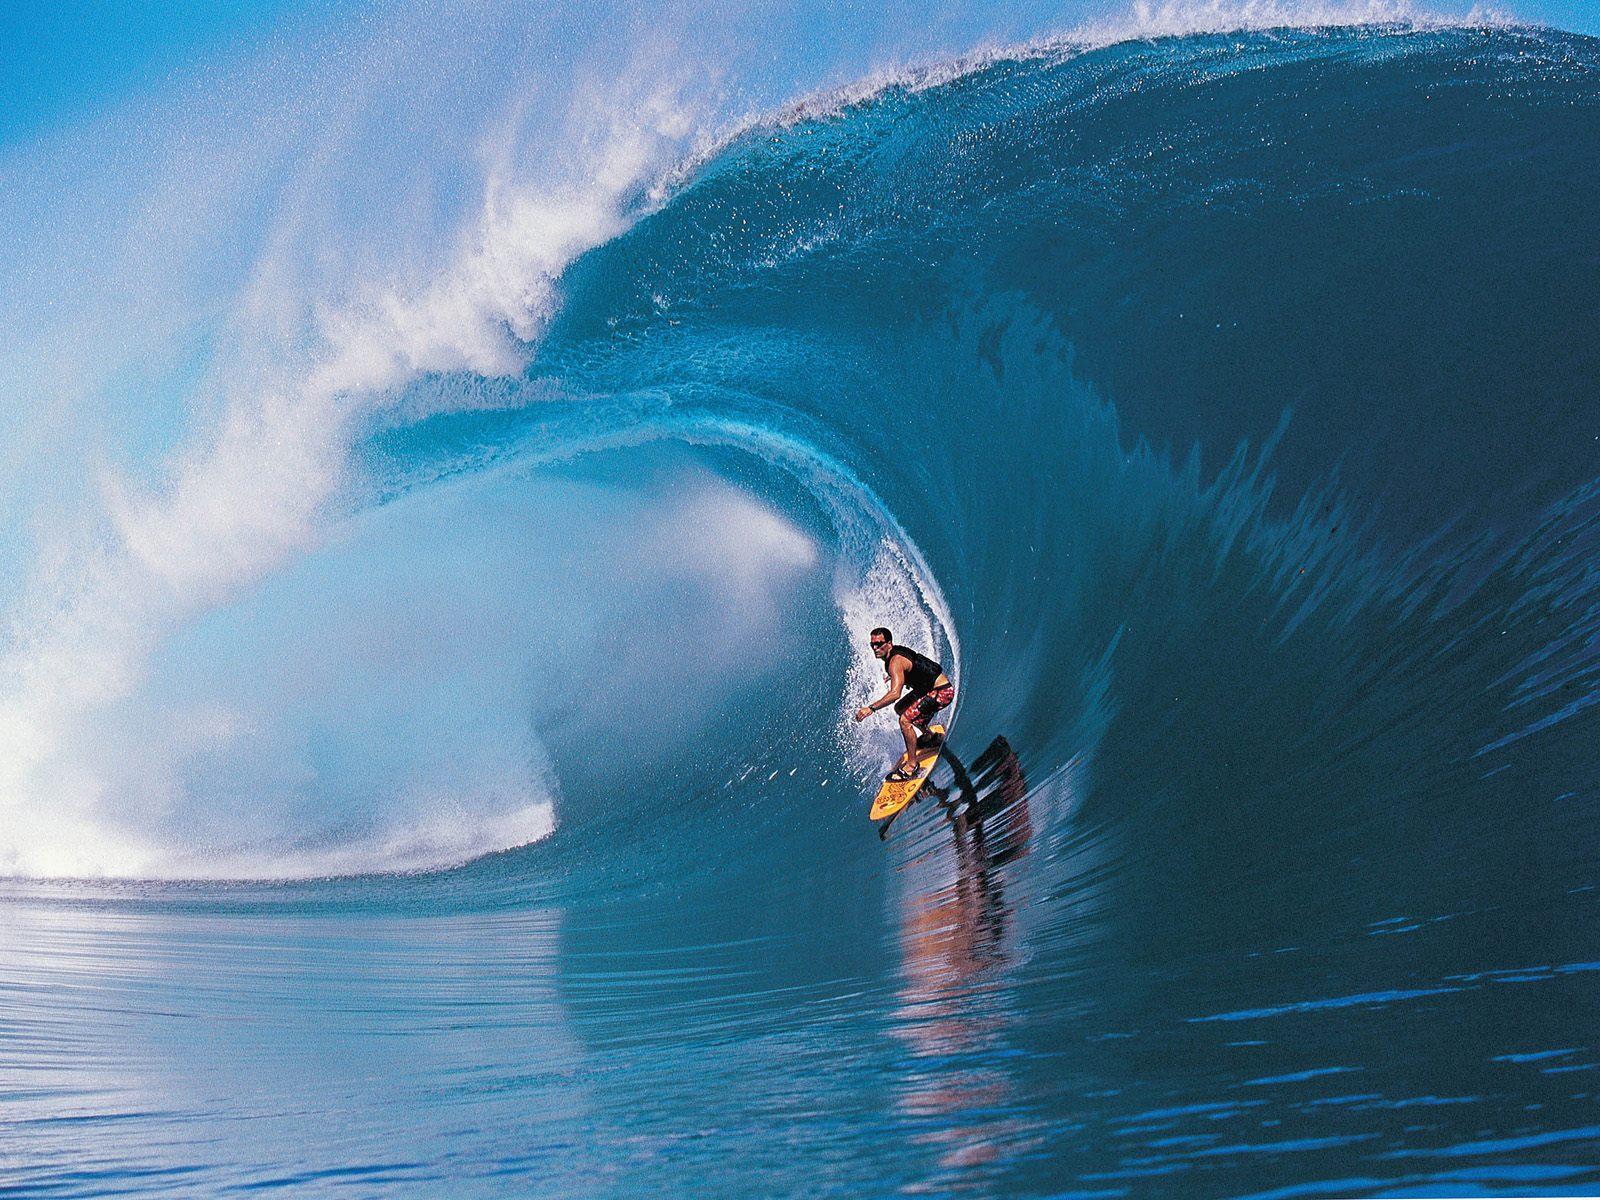 http://3.bp.blogspot.com/_HWUjcAgoVzY/S_rY4fmhk3I/AAAAAAAAADI/5SIkIhLtQBY/s1600/deportes-surf1-387781.jpg